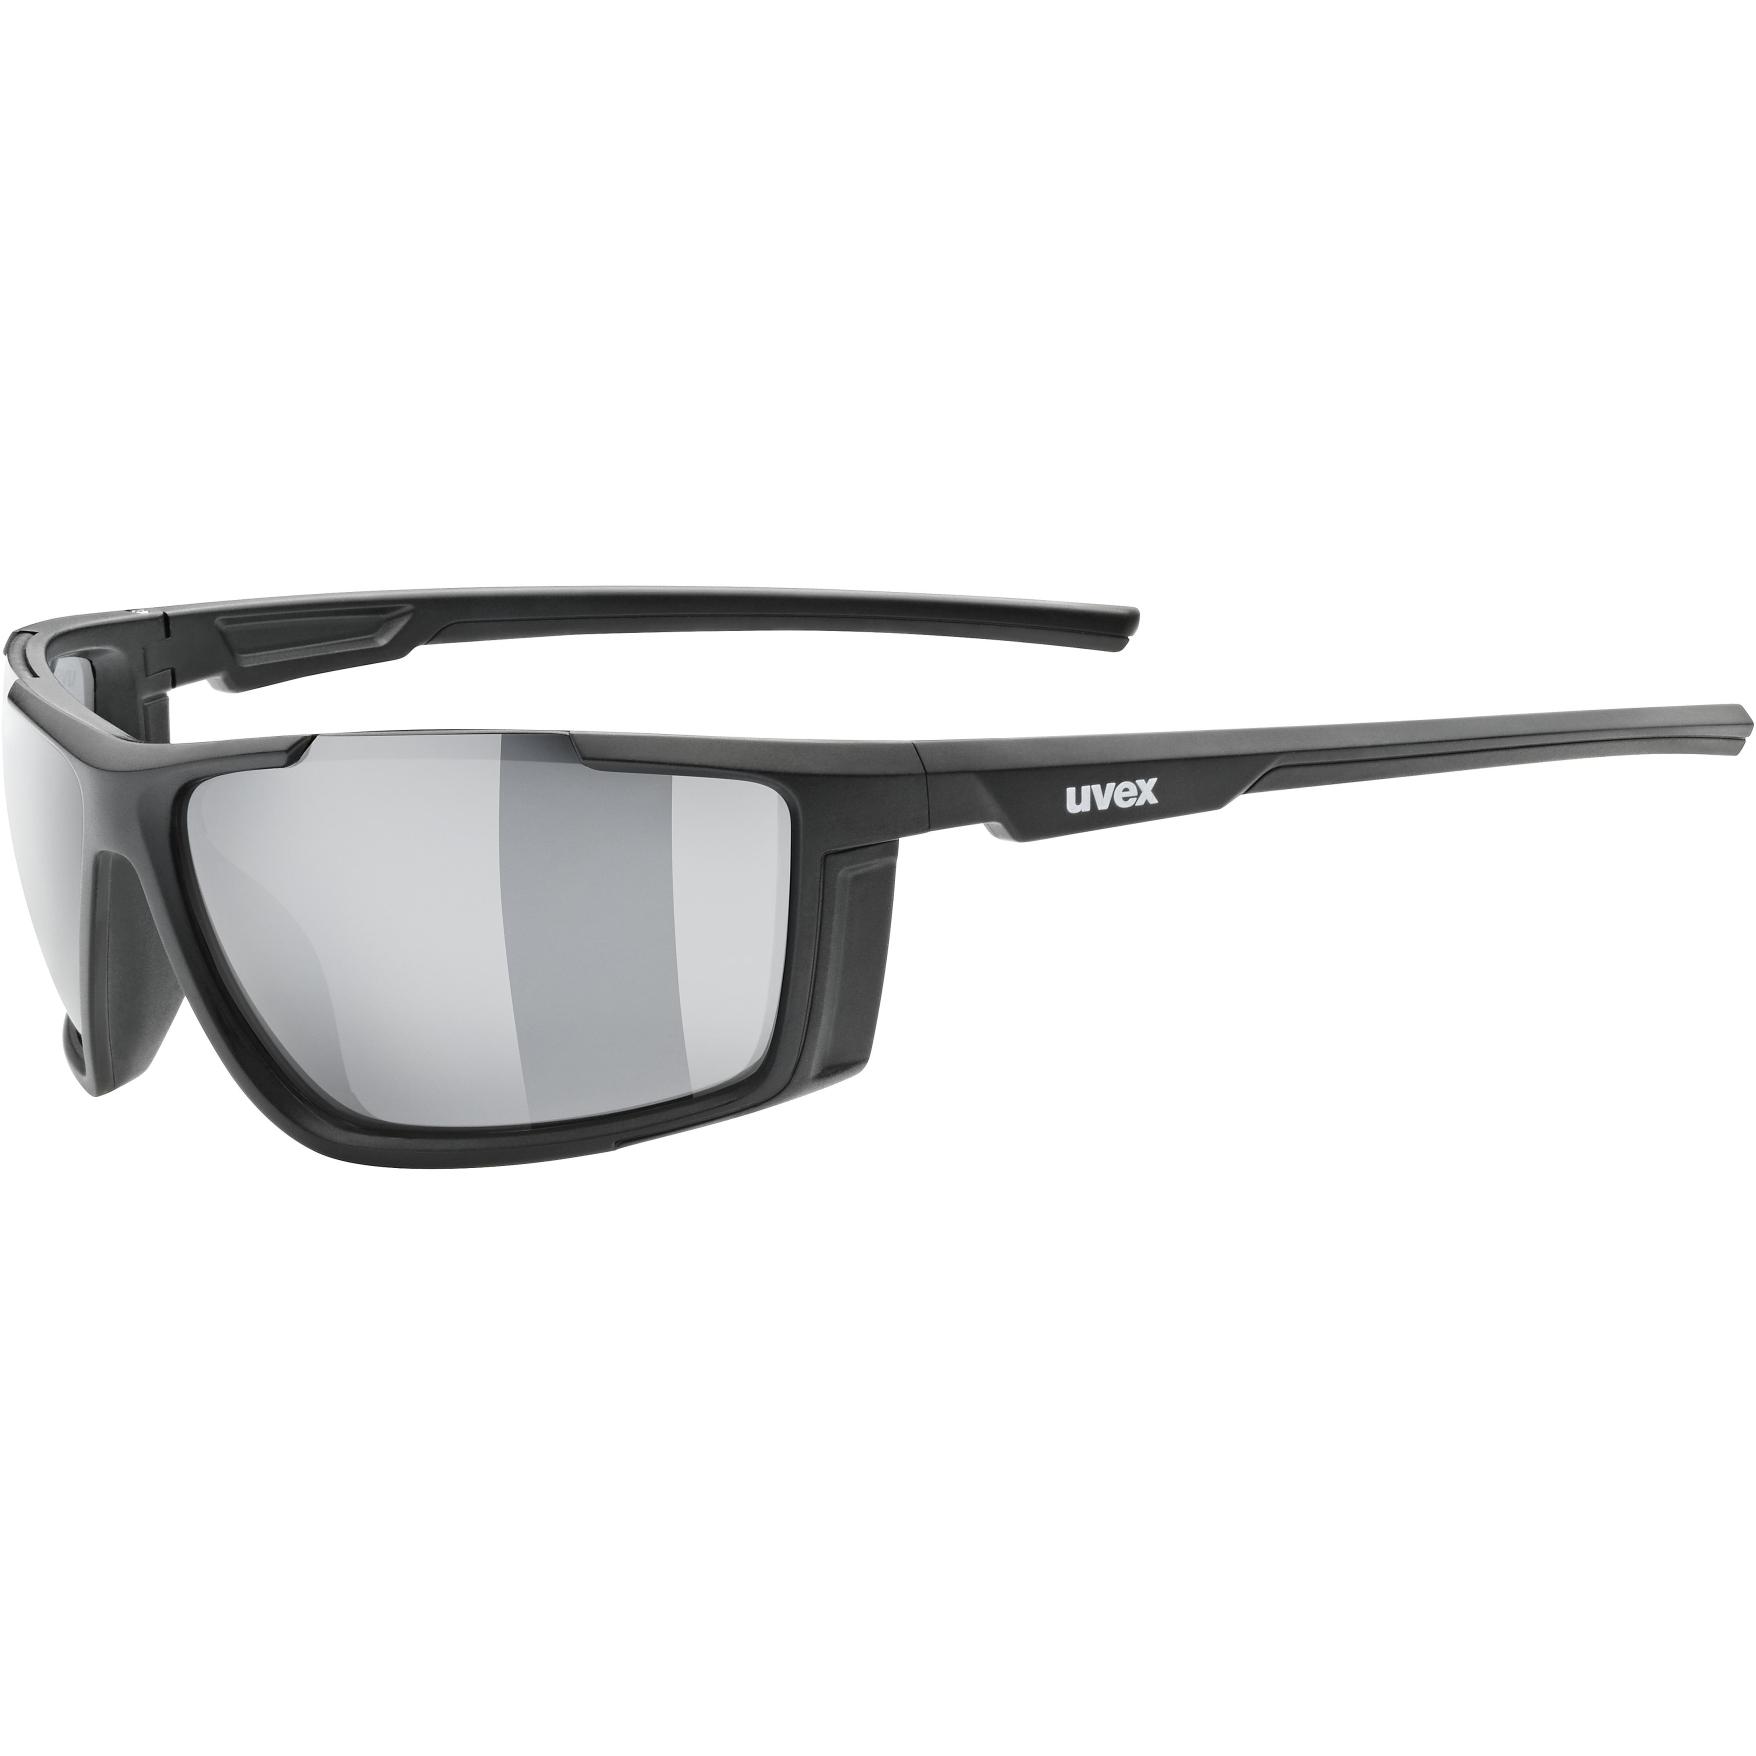 Uvex sportstyle 310 Glasses - black mat/mirror silver